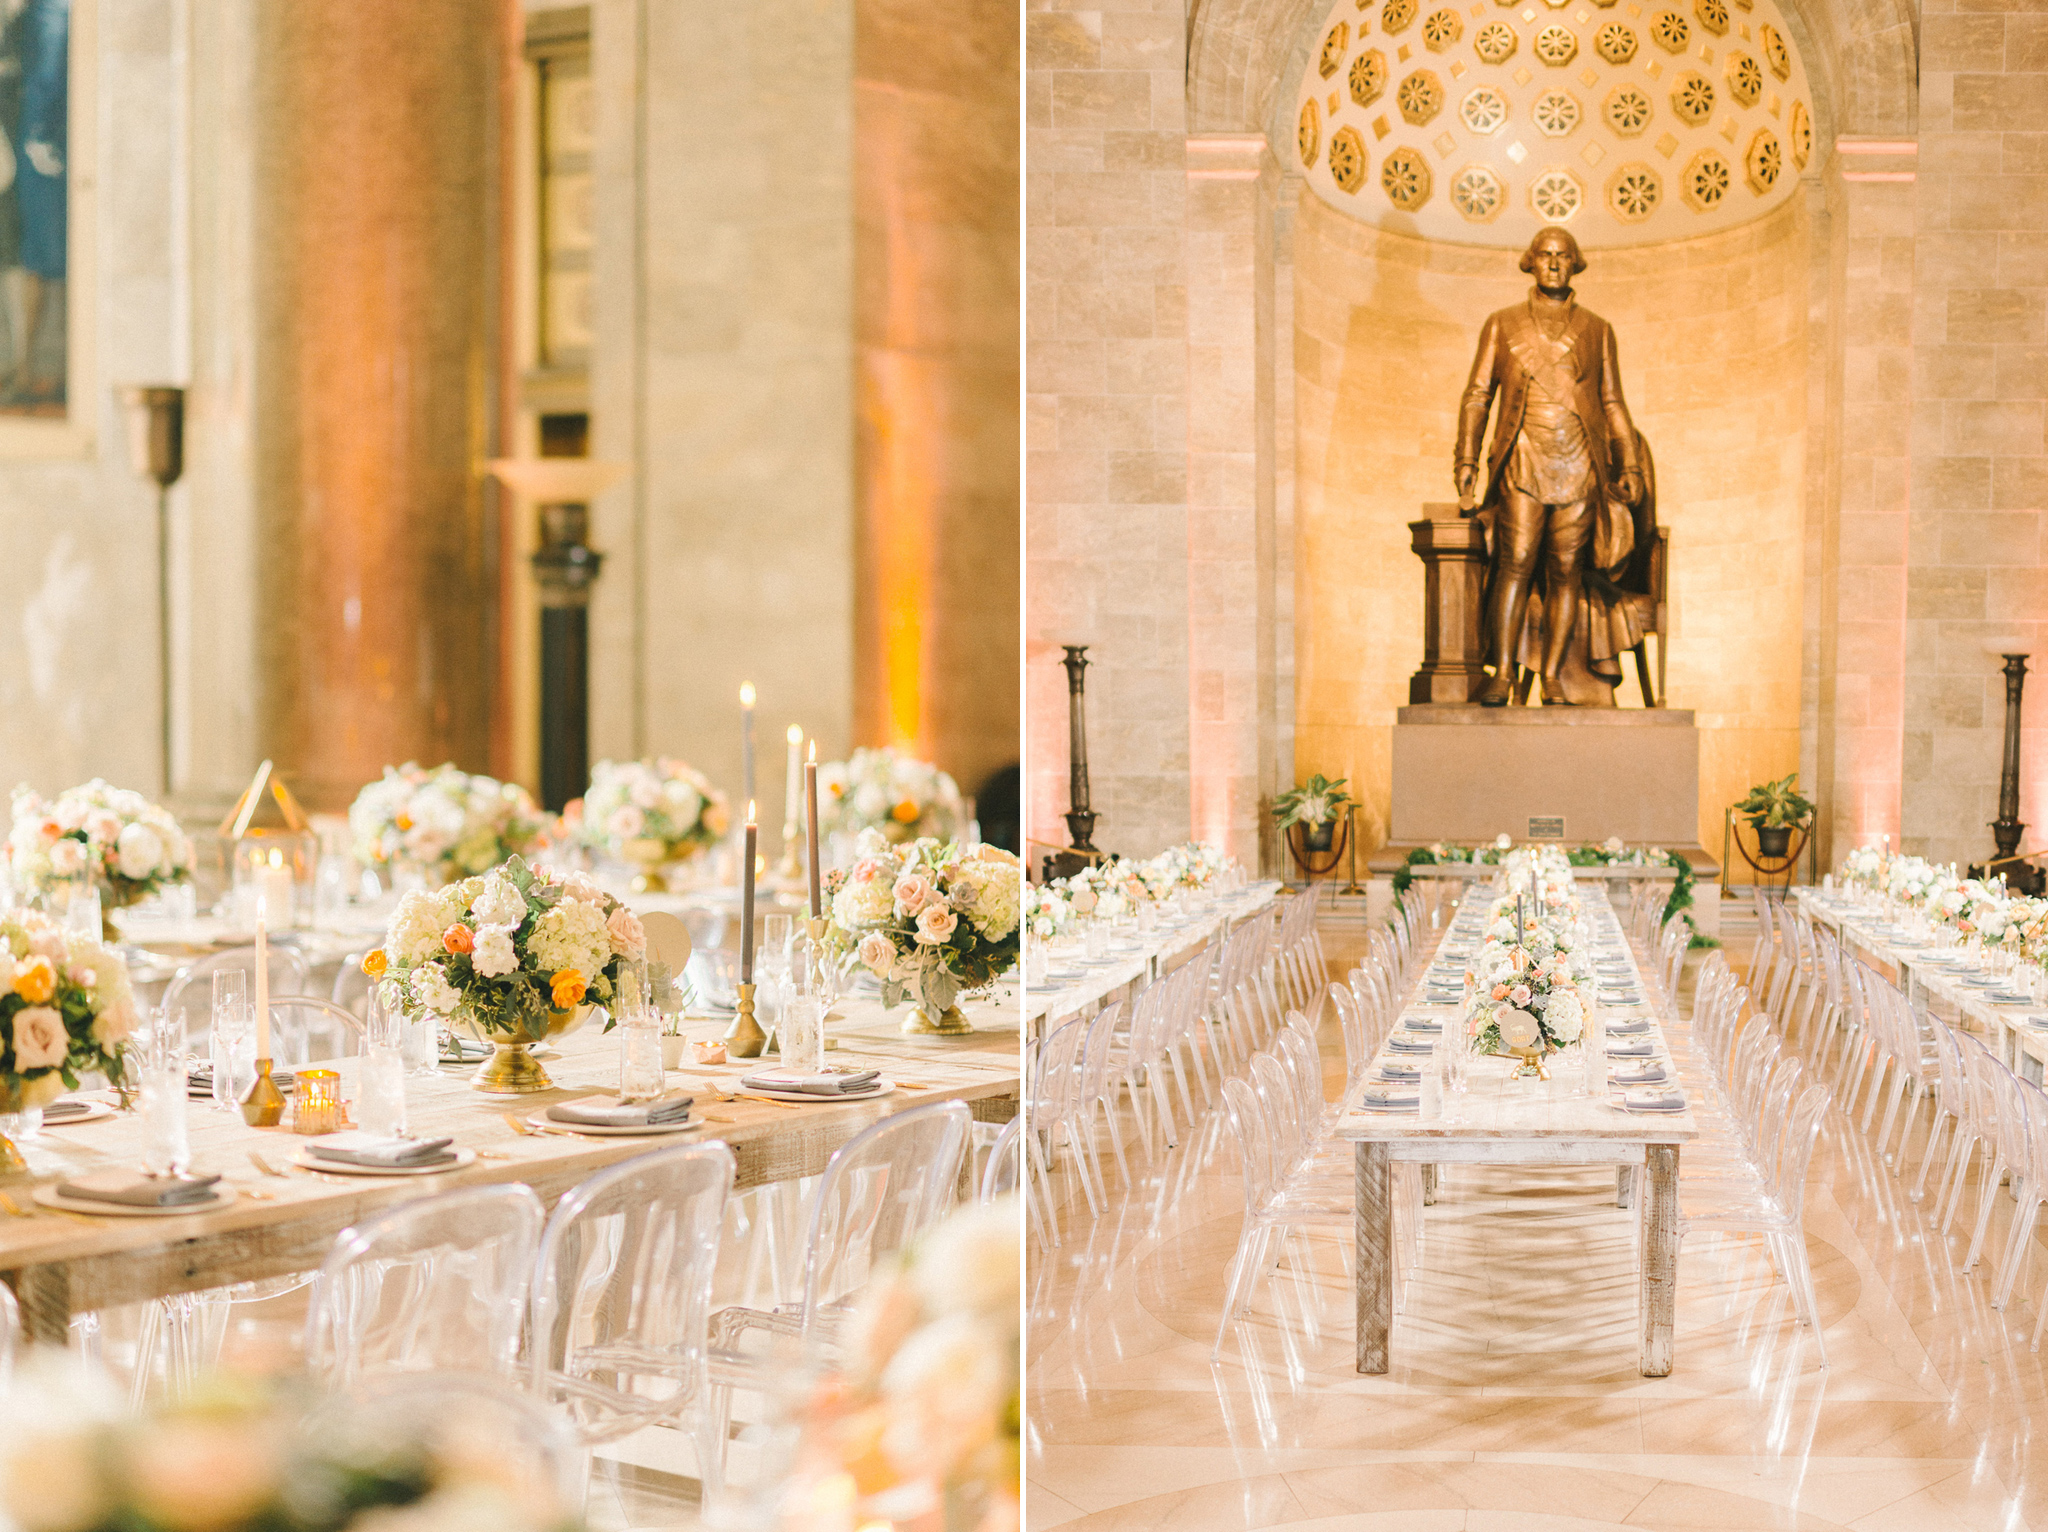 George washington national masonic memorial wedding for Rent wedding dress dc